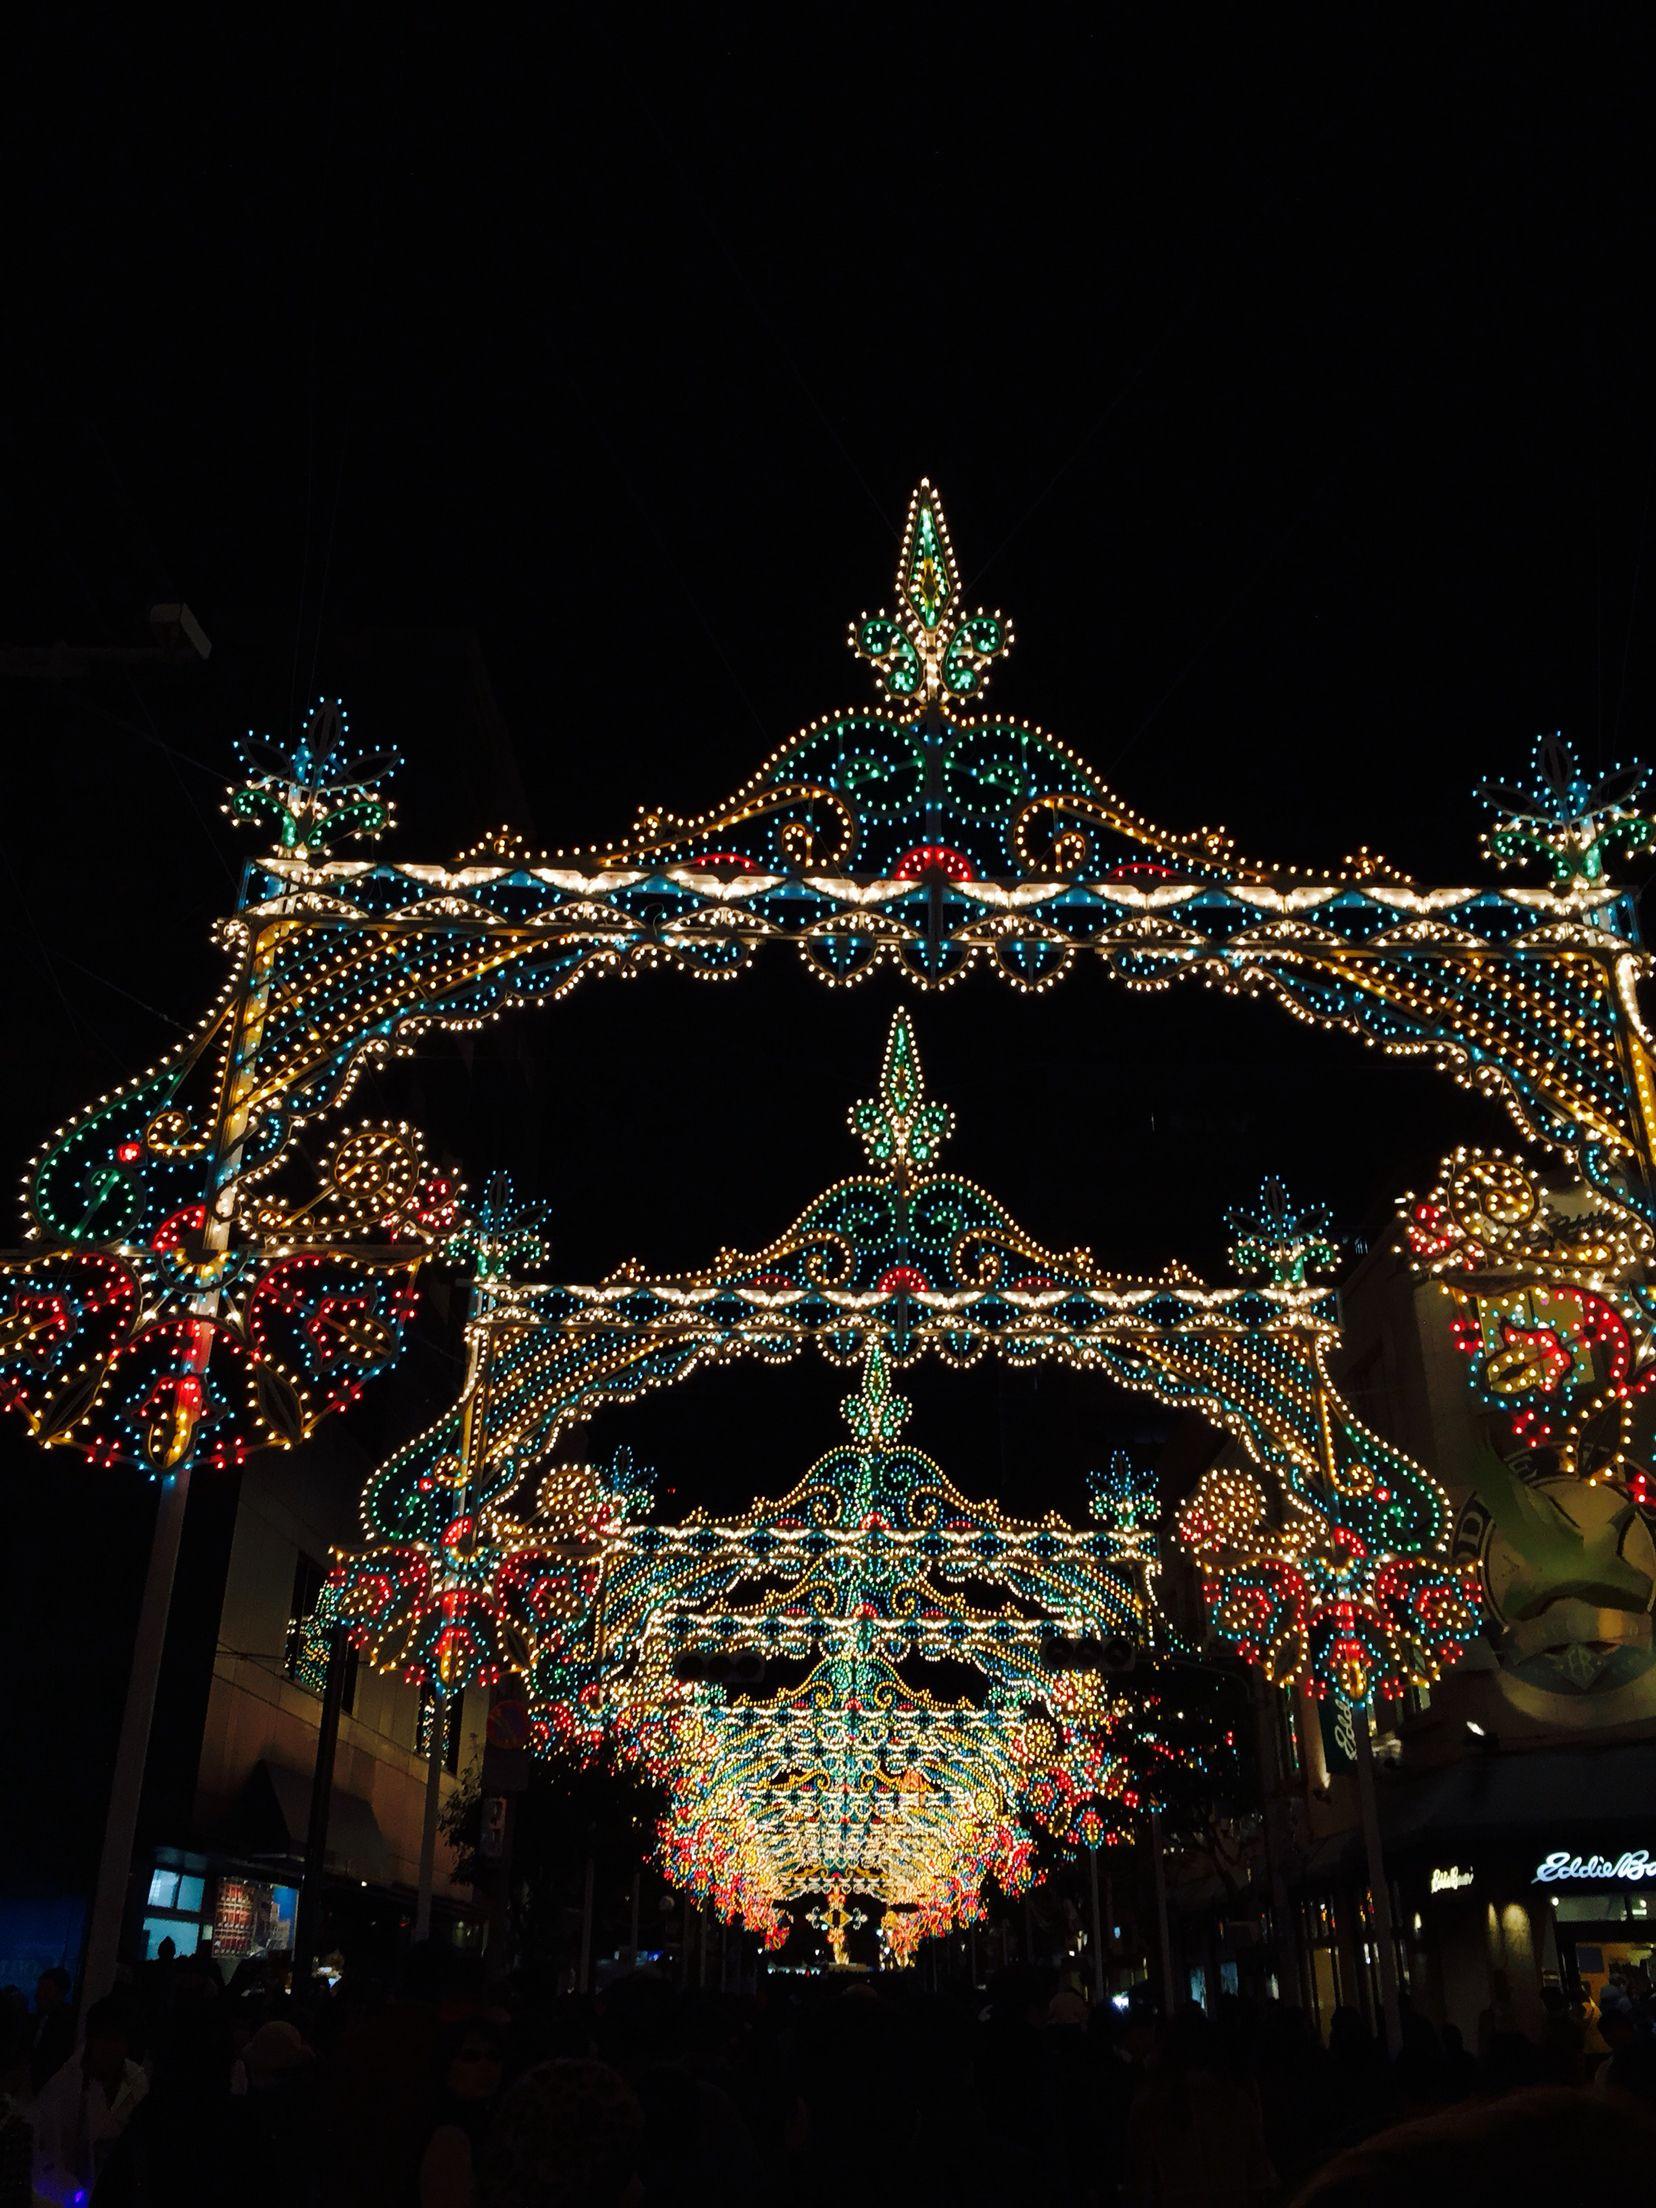 Luminarie Dec 2014, Kobe, Hyogo Prefecture, Japan